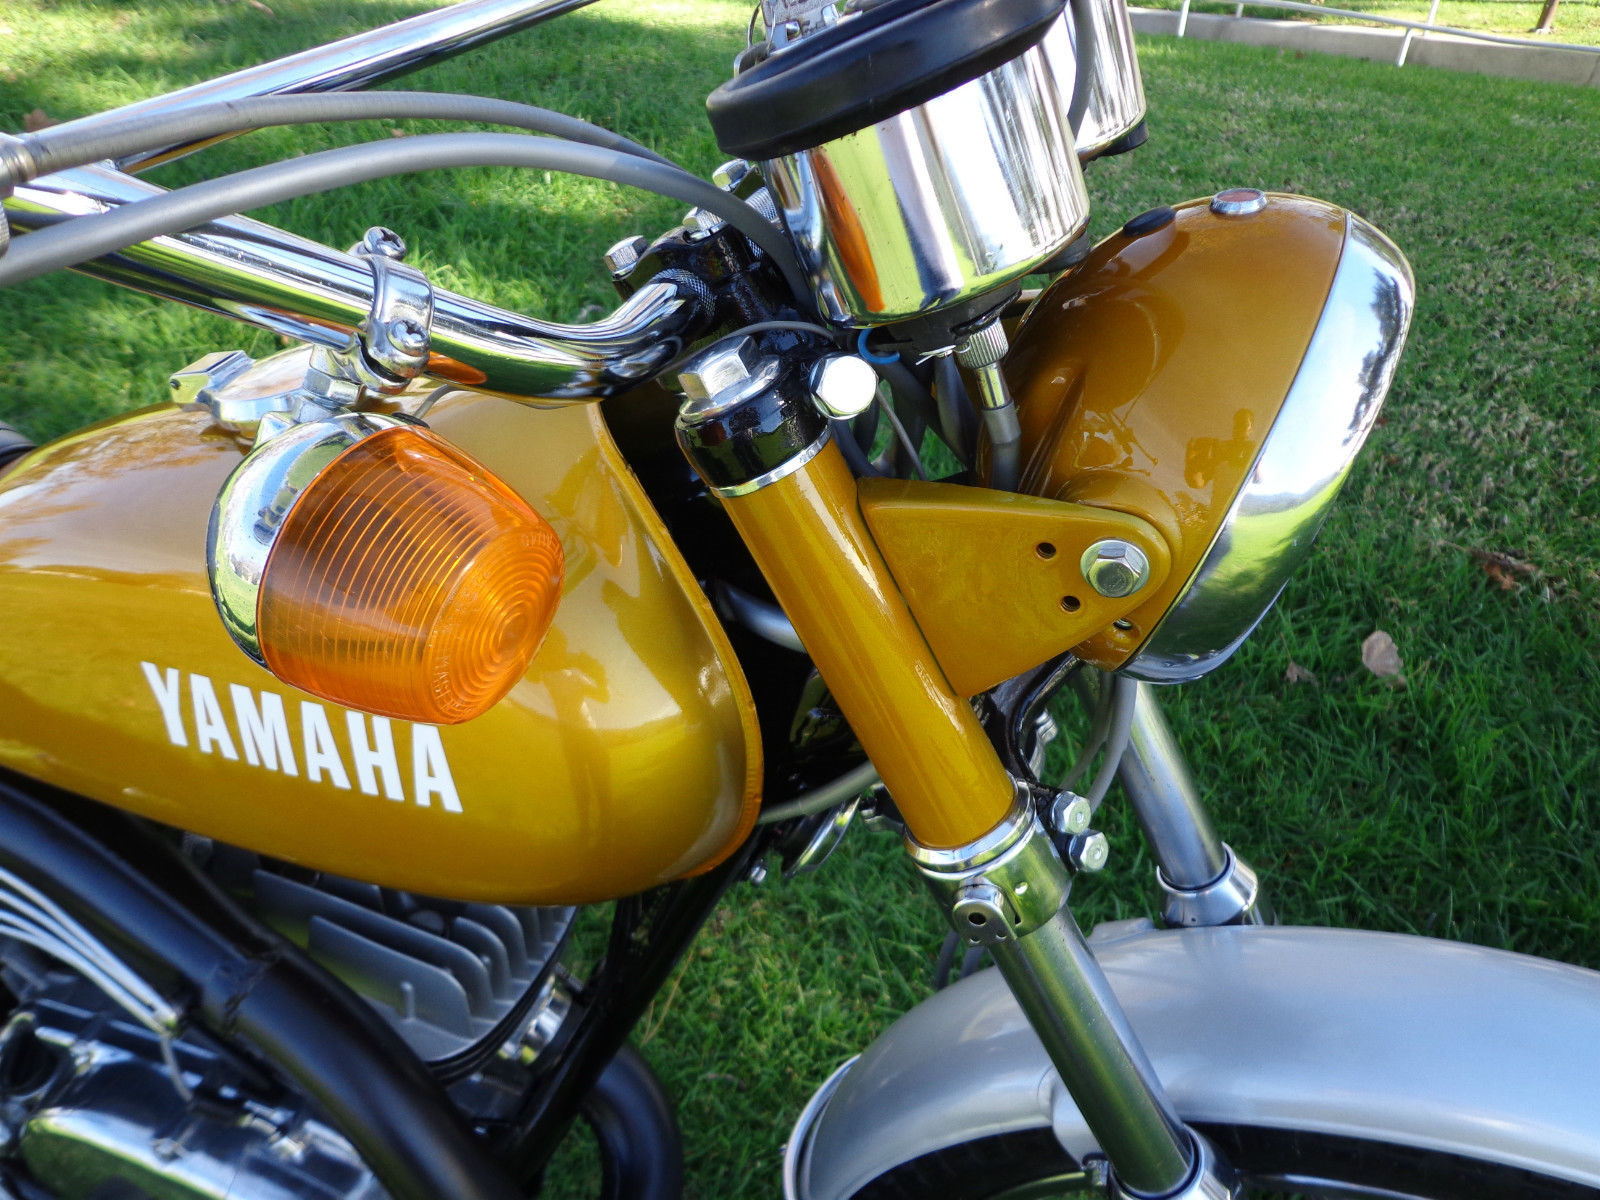 Yamaha DT250 - 1972 - Flasher, Handlebar and Clocks.